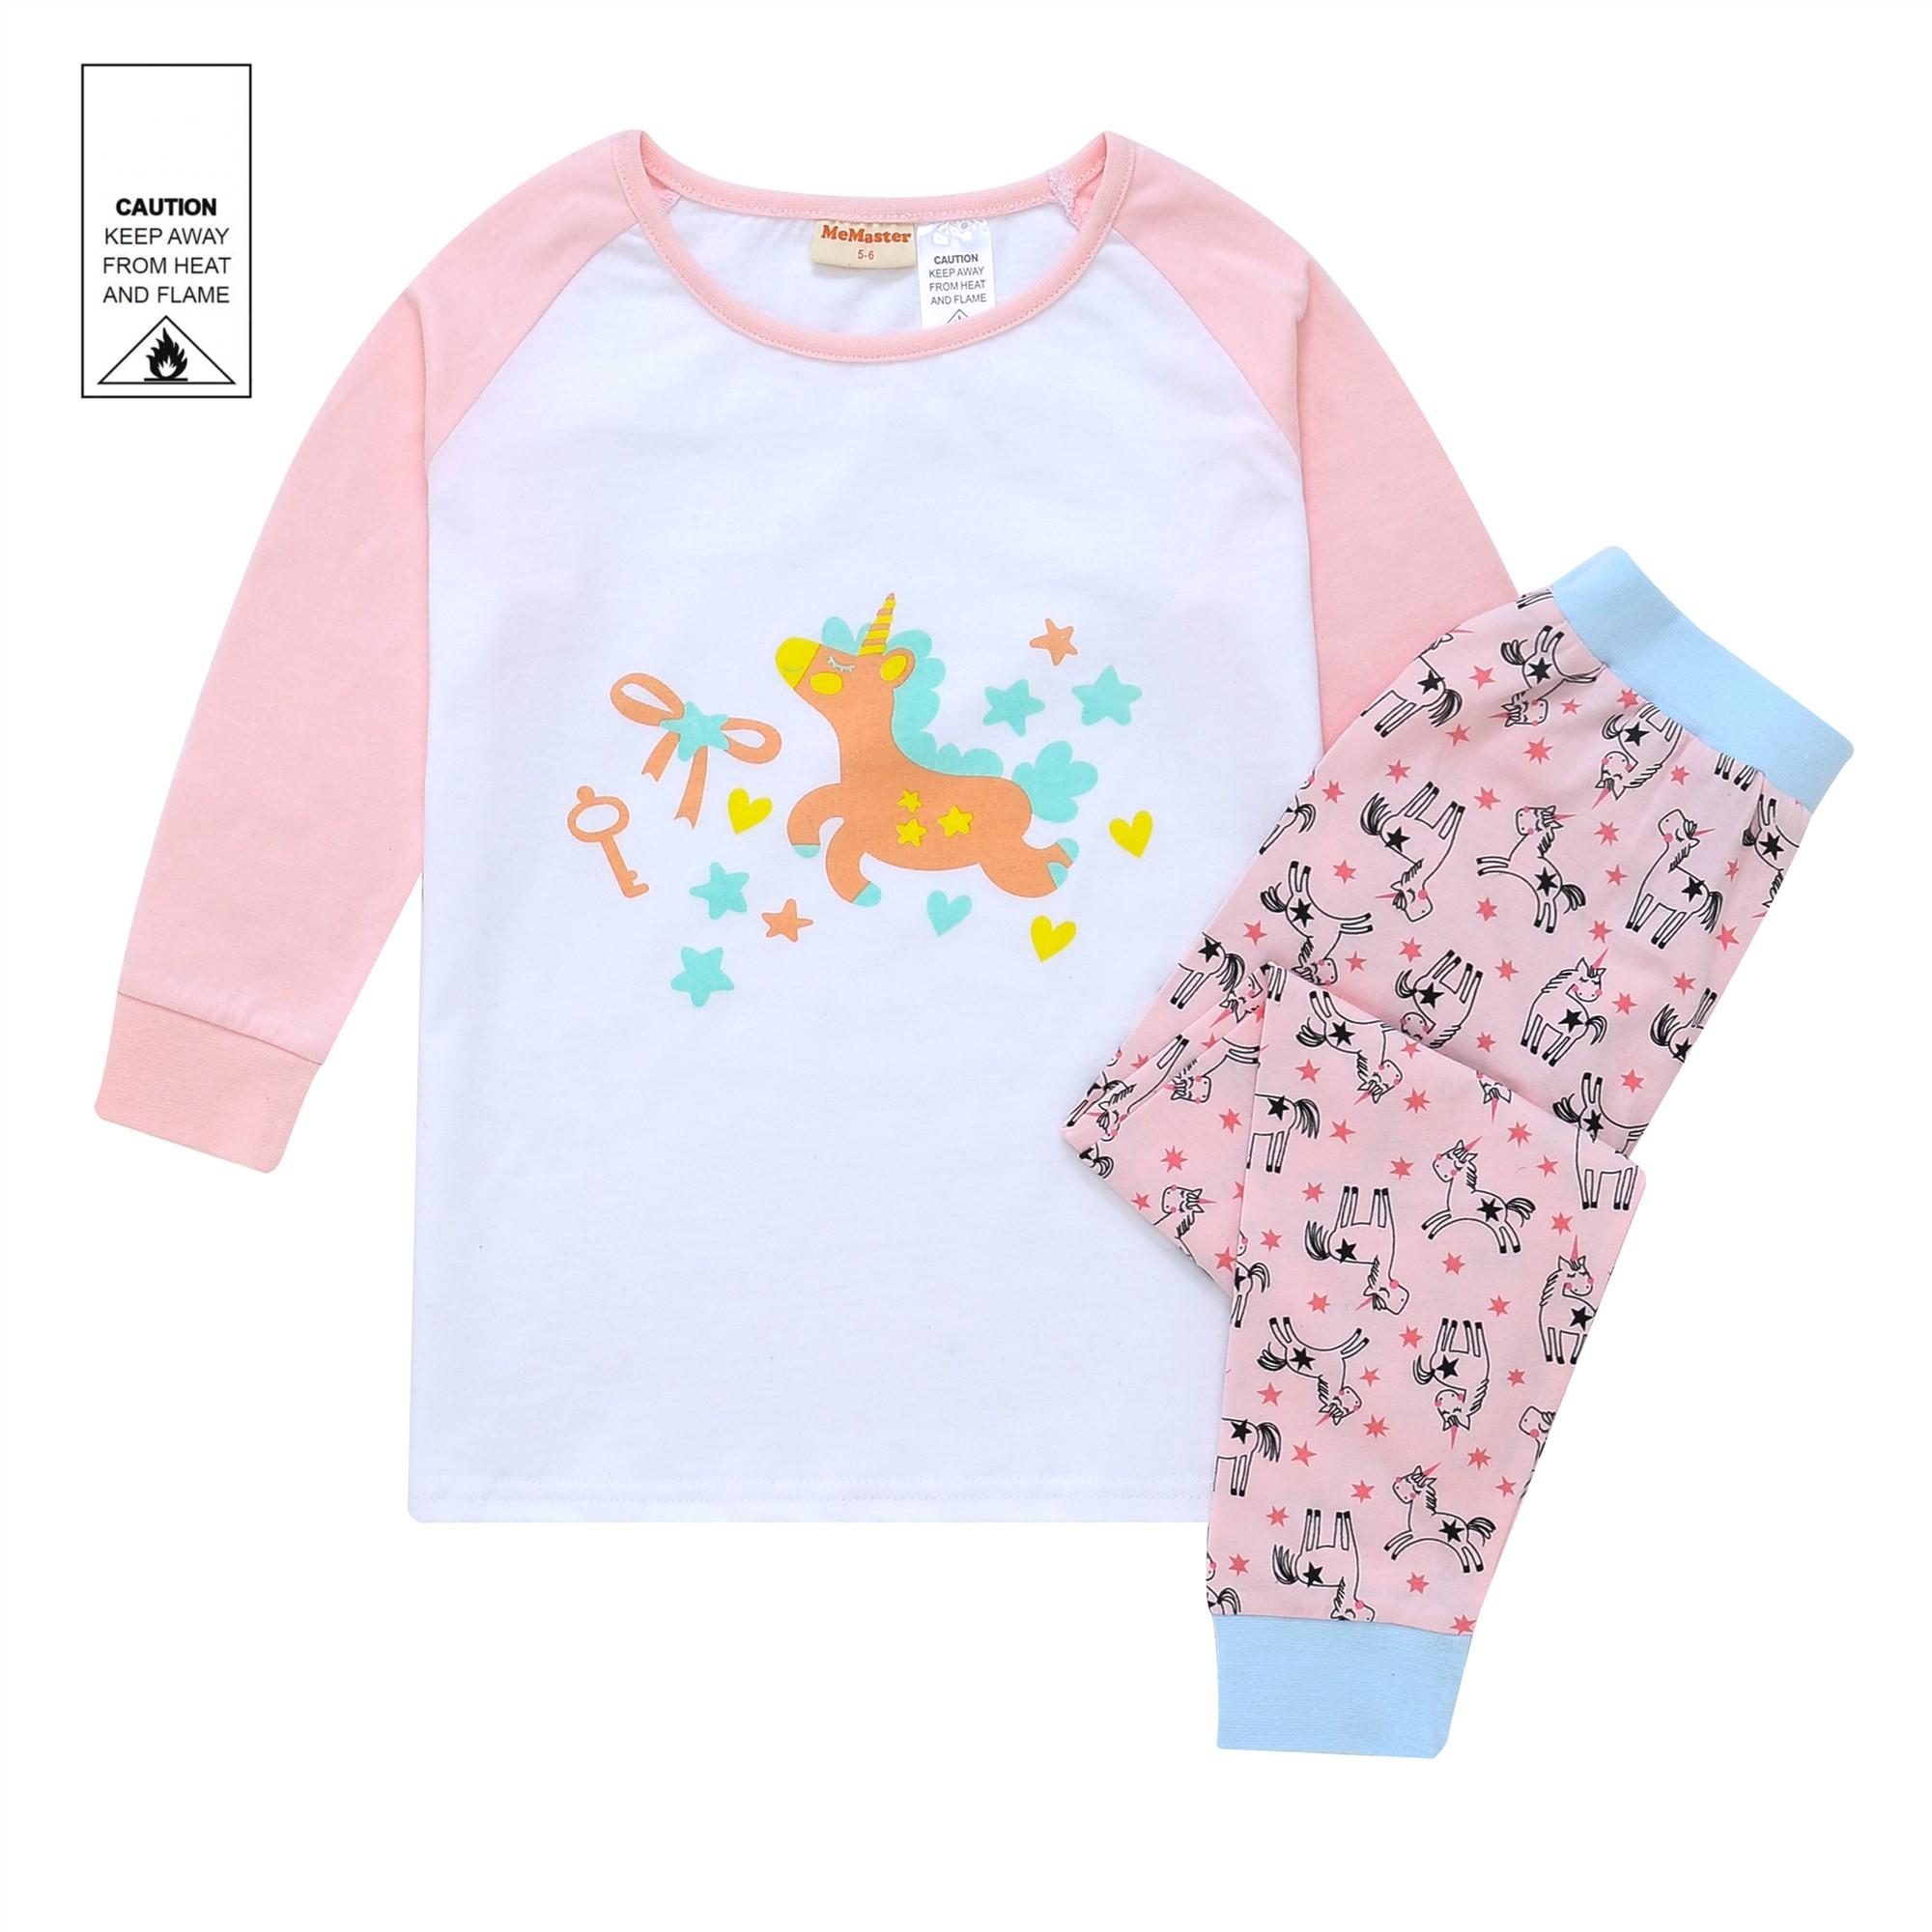 AW1922 Baby Girls Unicorn Pyjama Set - Pink